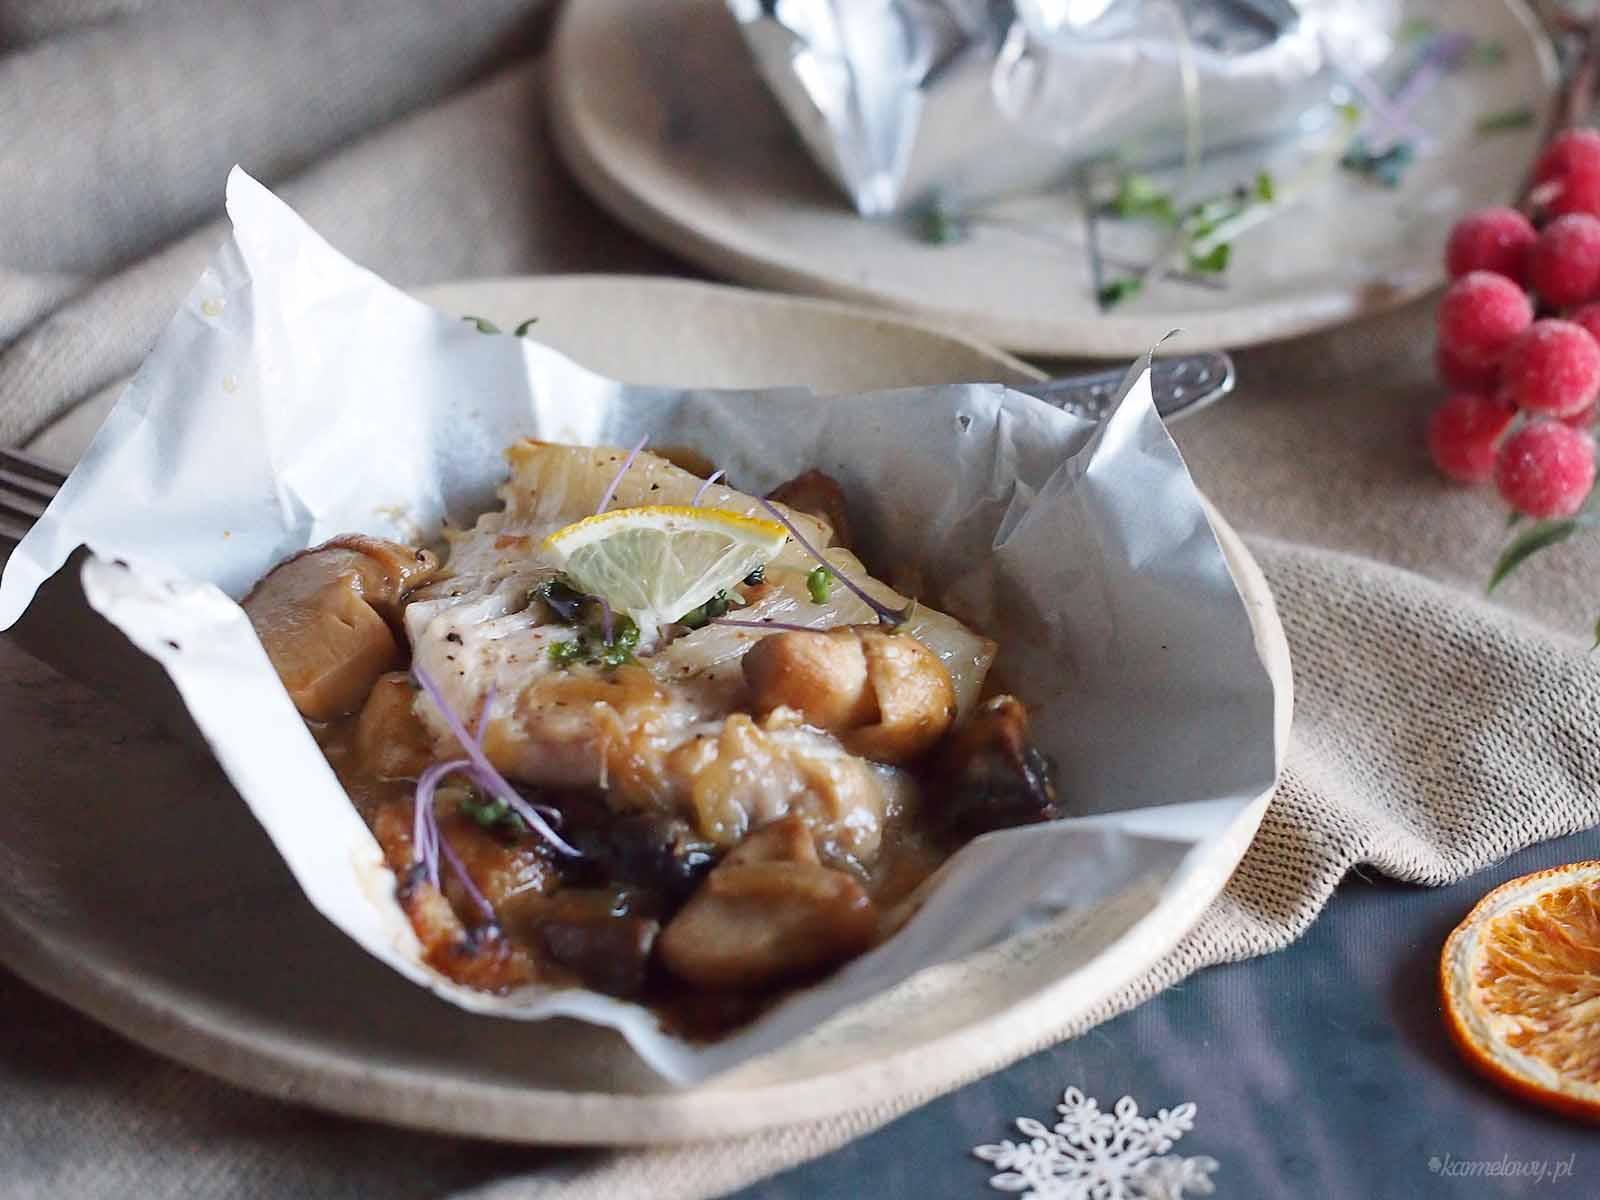 Pakieciki-z-karpiem-i-grzybami-Carp-and-mushrooms-en-papillote